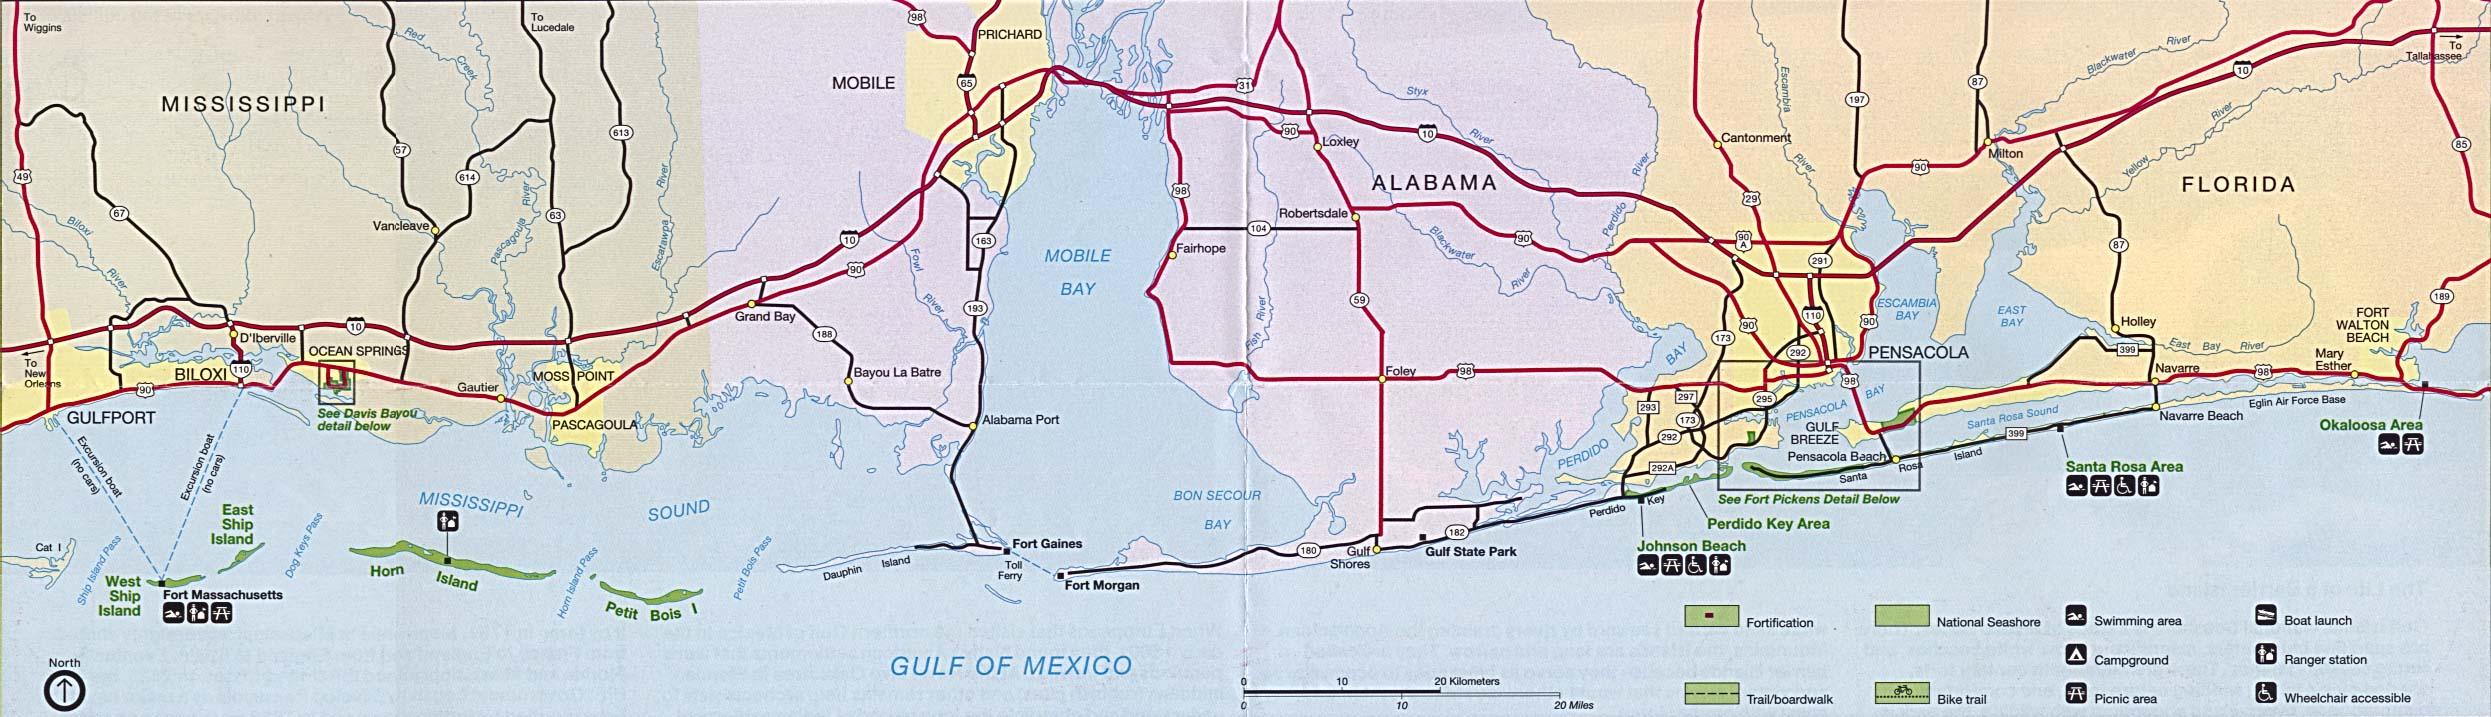 Free Florida Road Map.Download Free Maps Of Florida